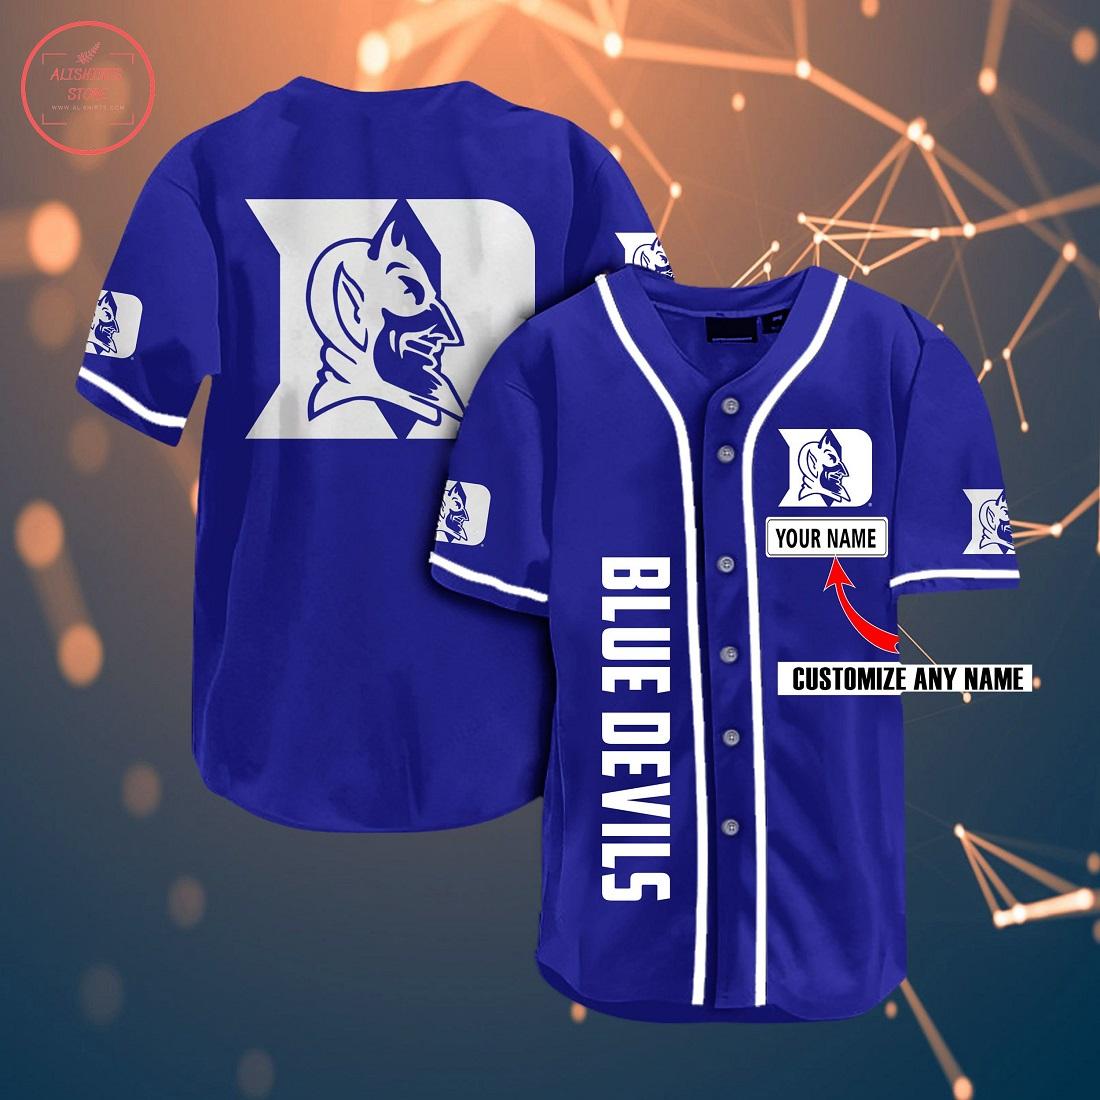 Ncaa Duke Blue Devils Personalized Baseball Jersey